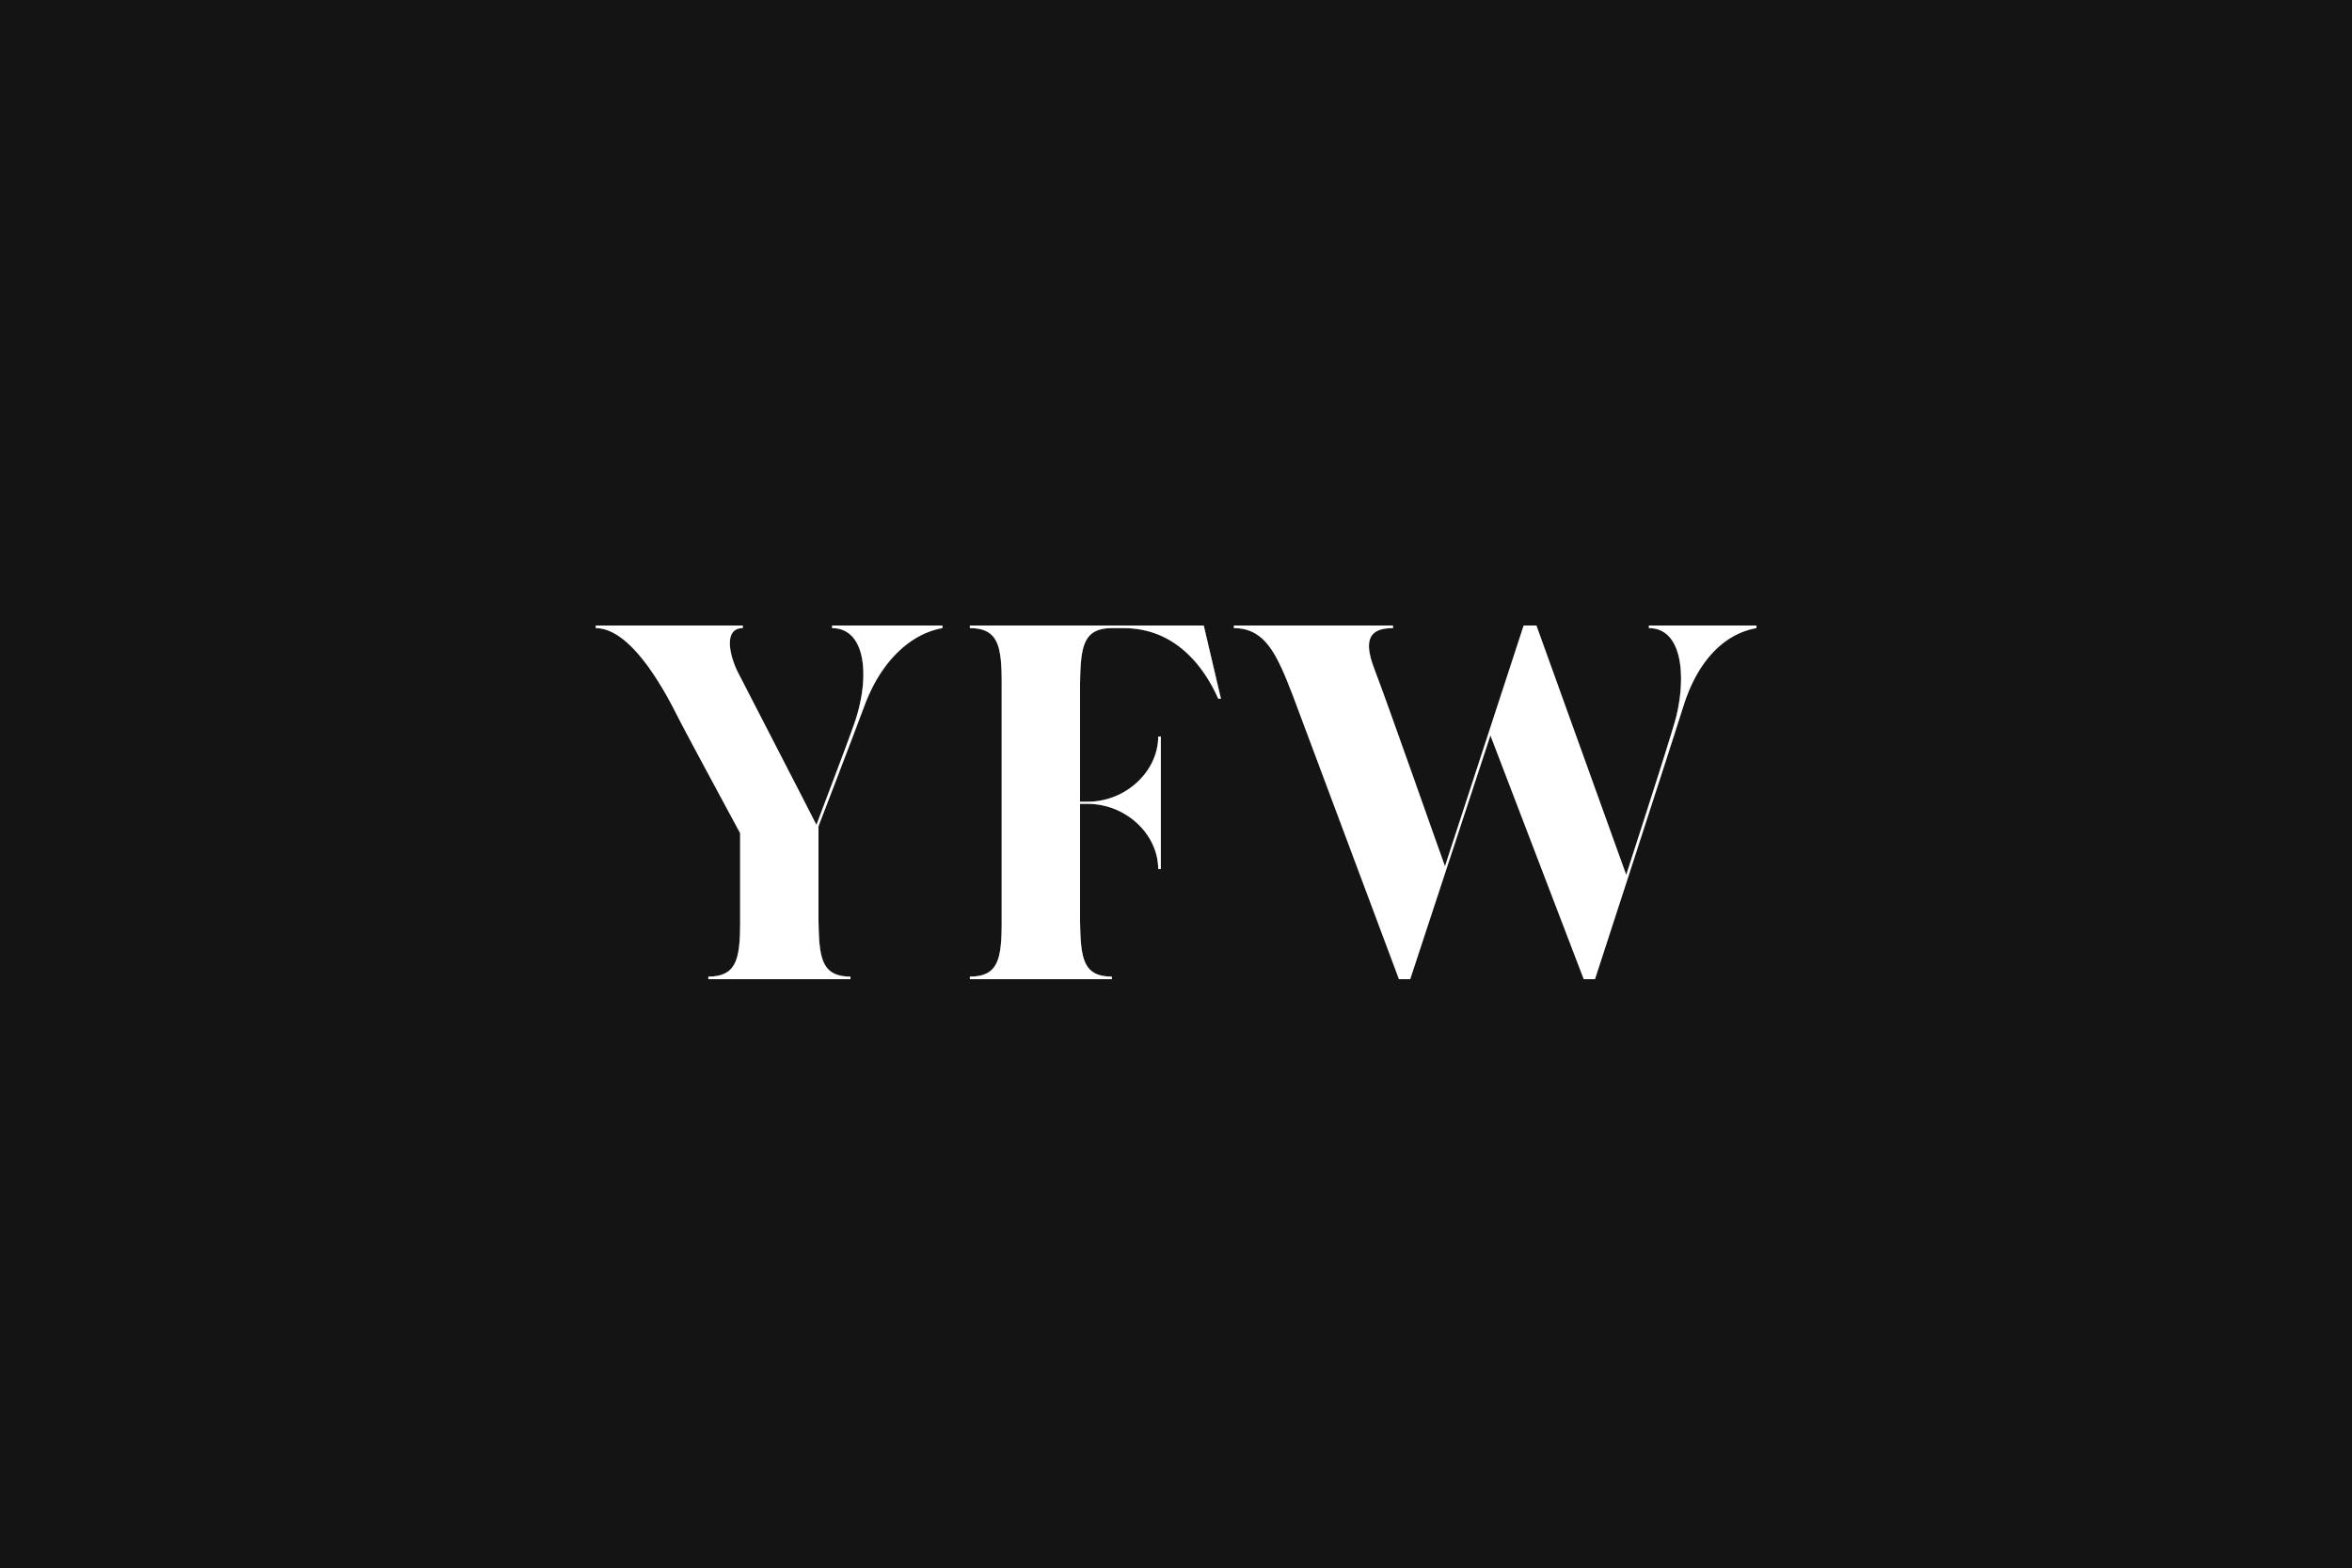 yfw-logo-black